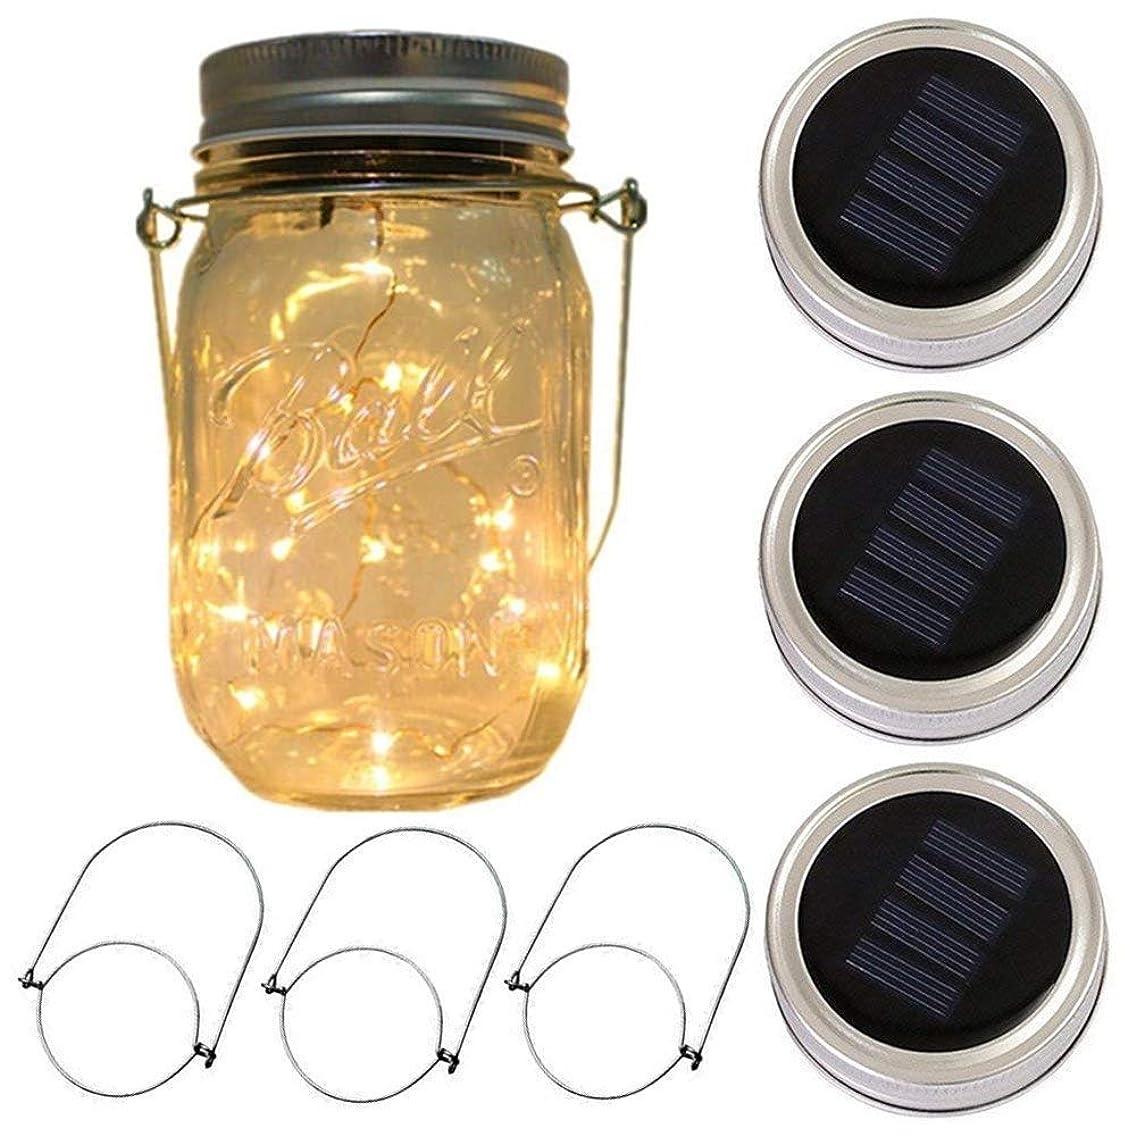 3-Pack Solar-powered Mason Jar Lights(3 Hanger Included/No Jar),10 Bulbs Warm White Jar Hanging Light,Solar Fairy Firefly Lights Lids Insert Fit for Regular Mouth Jars for Decor Solar Table Light